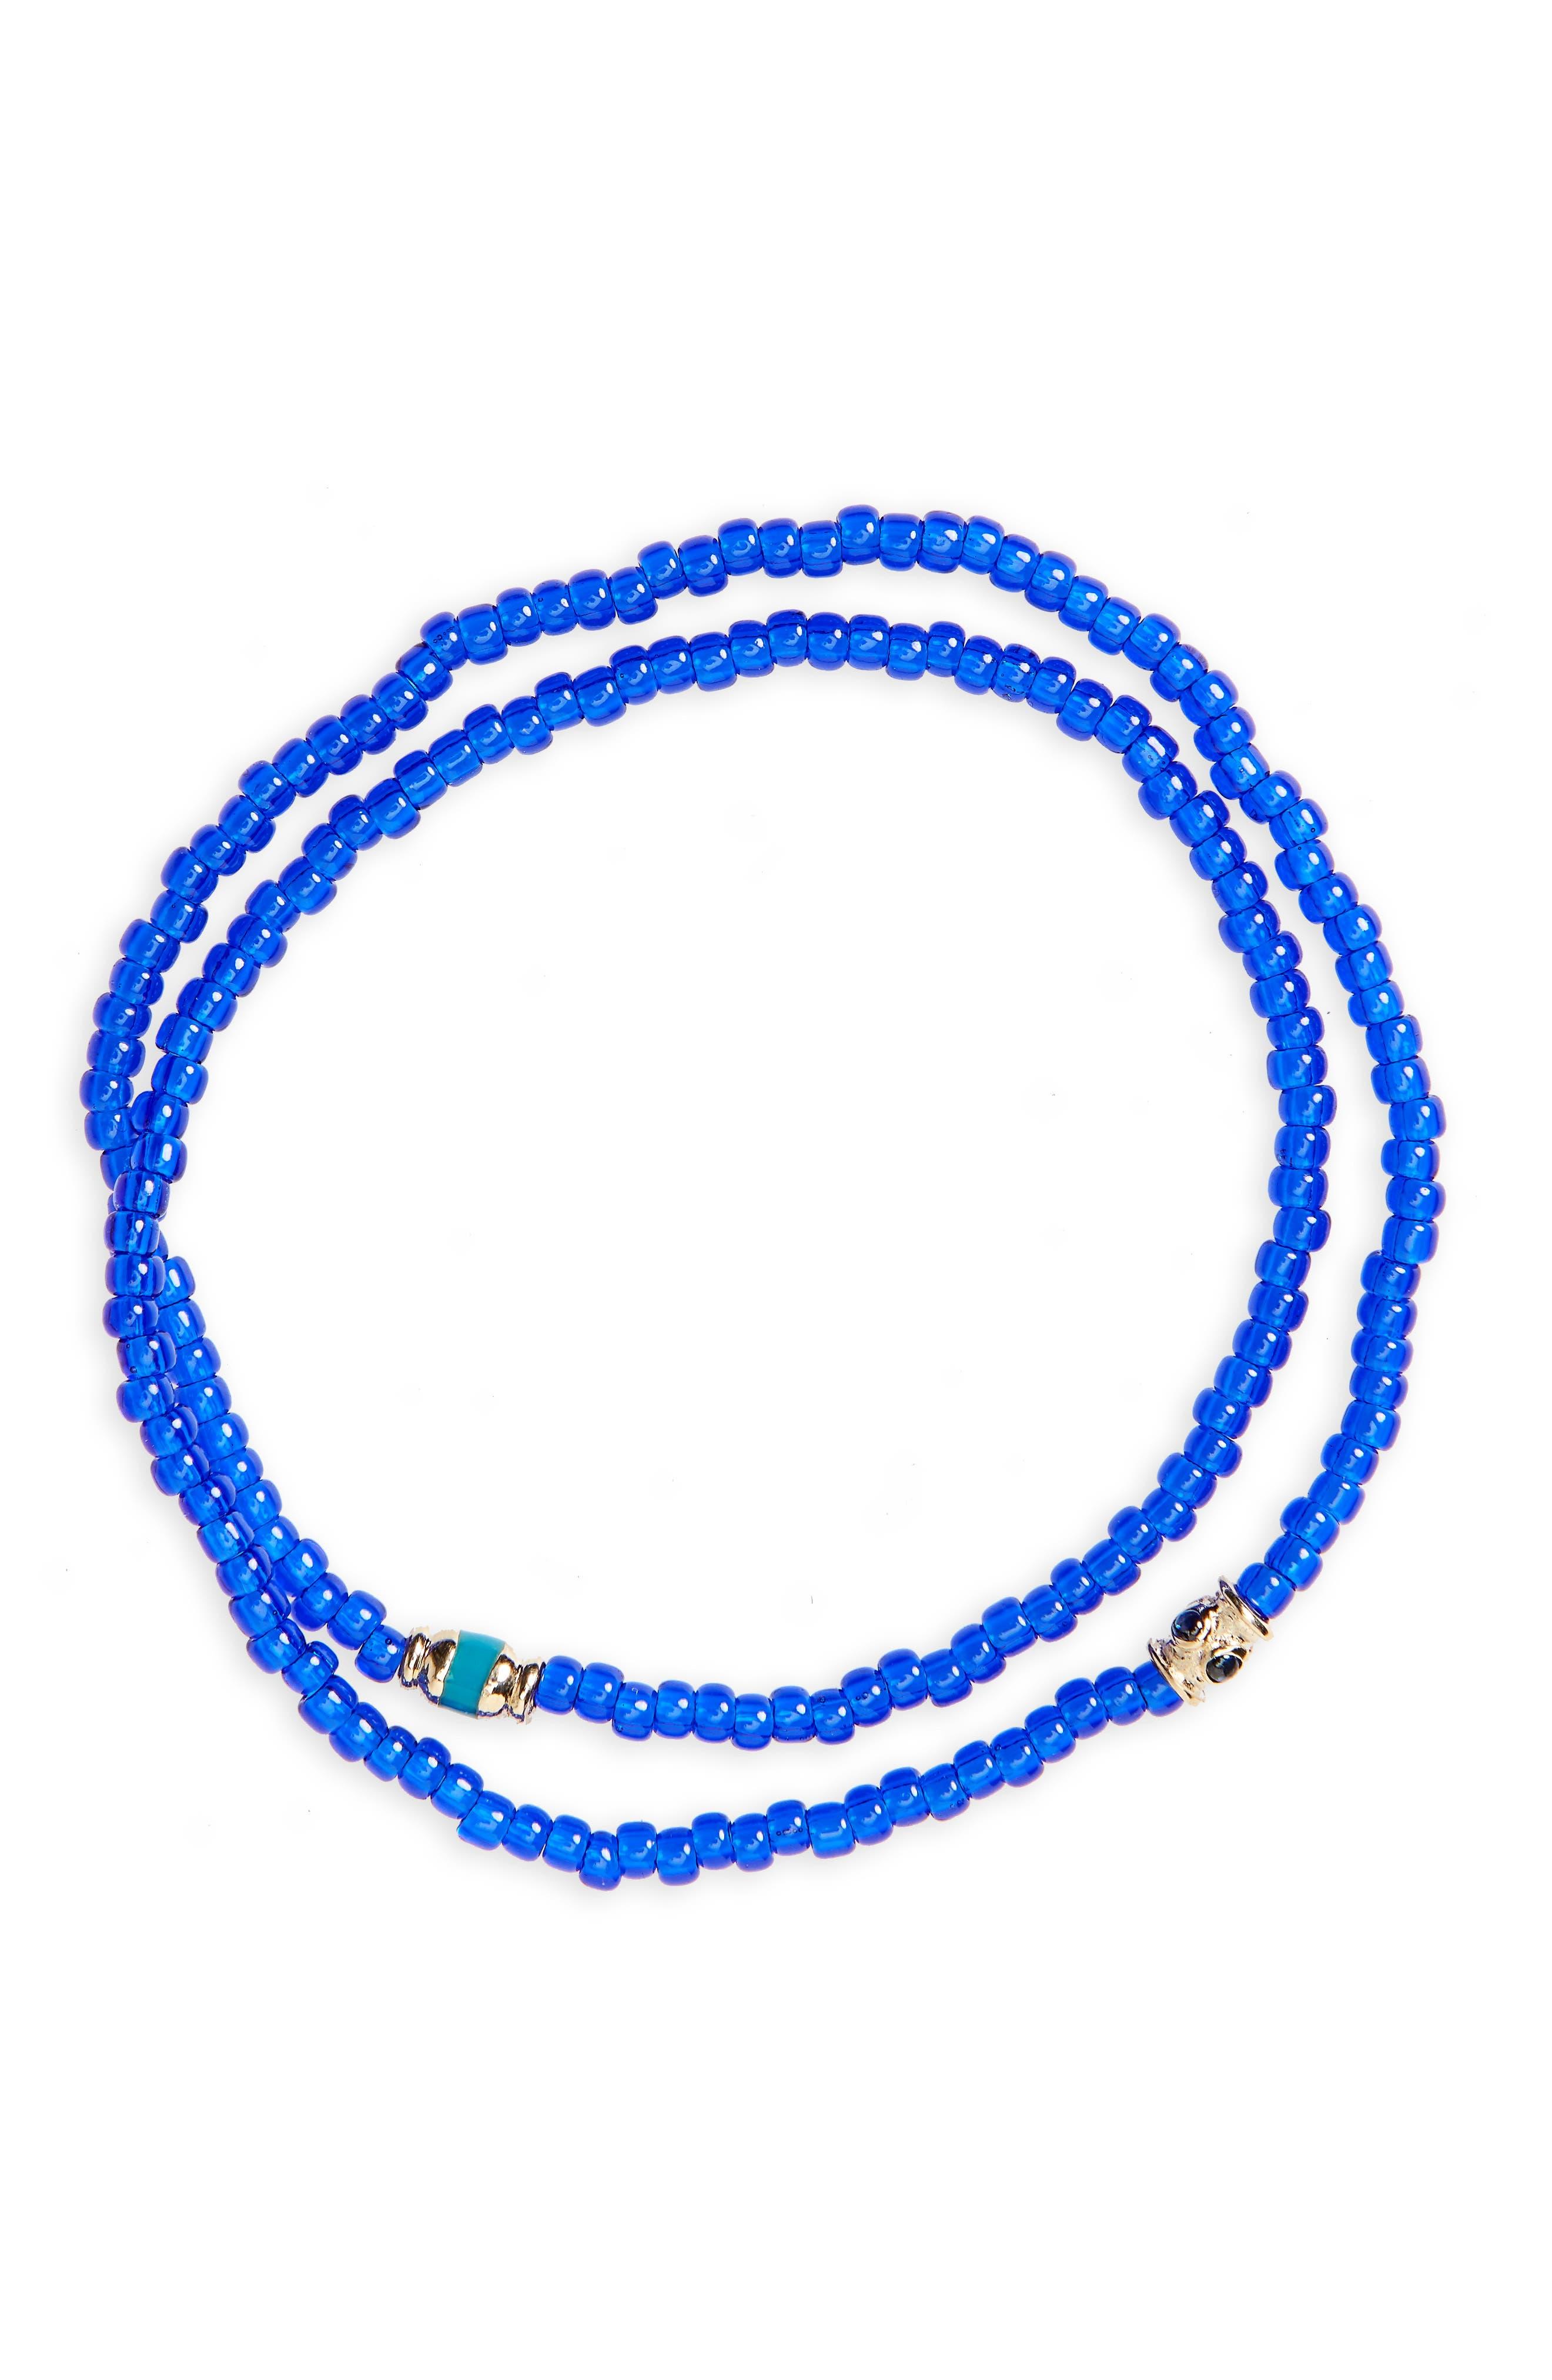 Luis Morais Sapphire and Gold Double Strand Stretch Bracelet